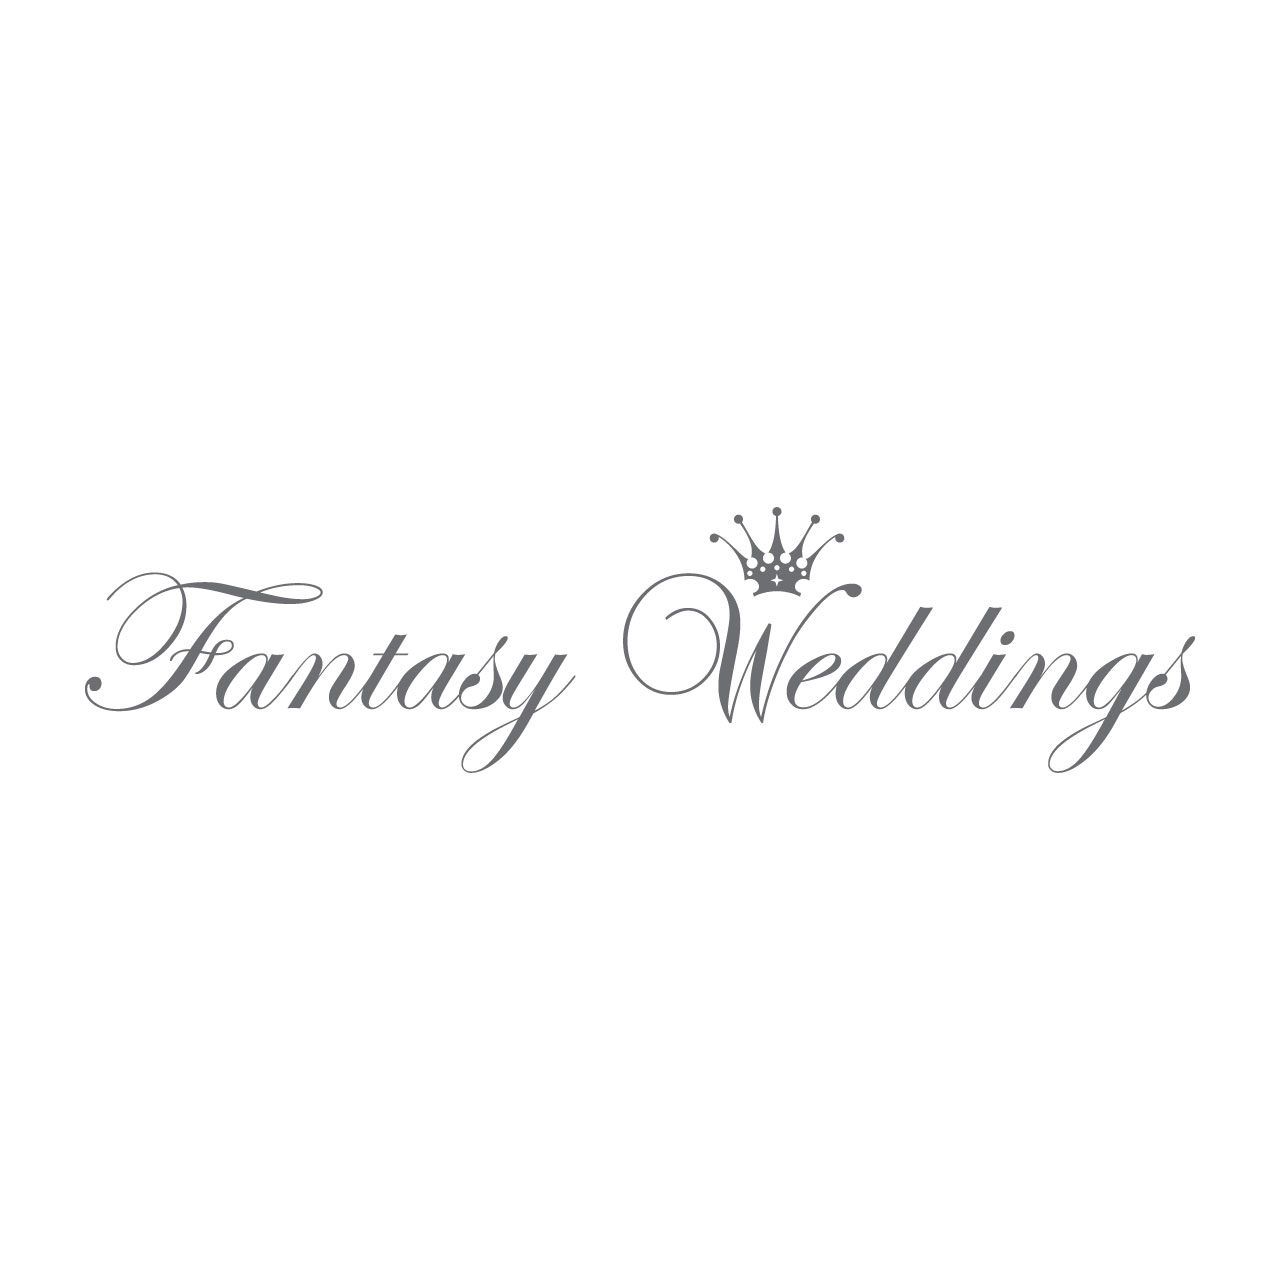 Fantasy Weddings logo